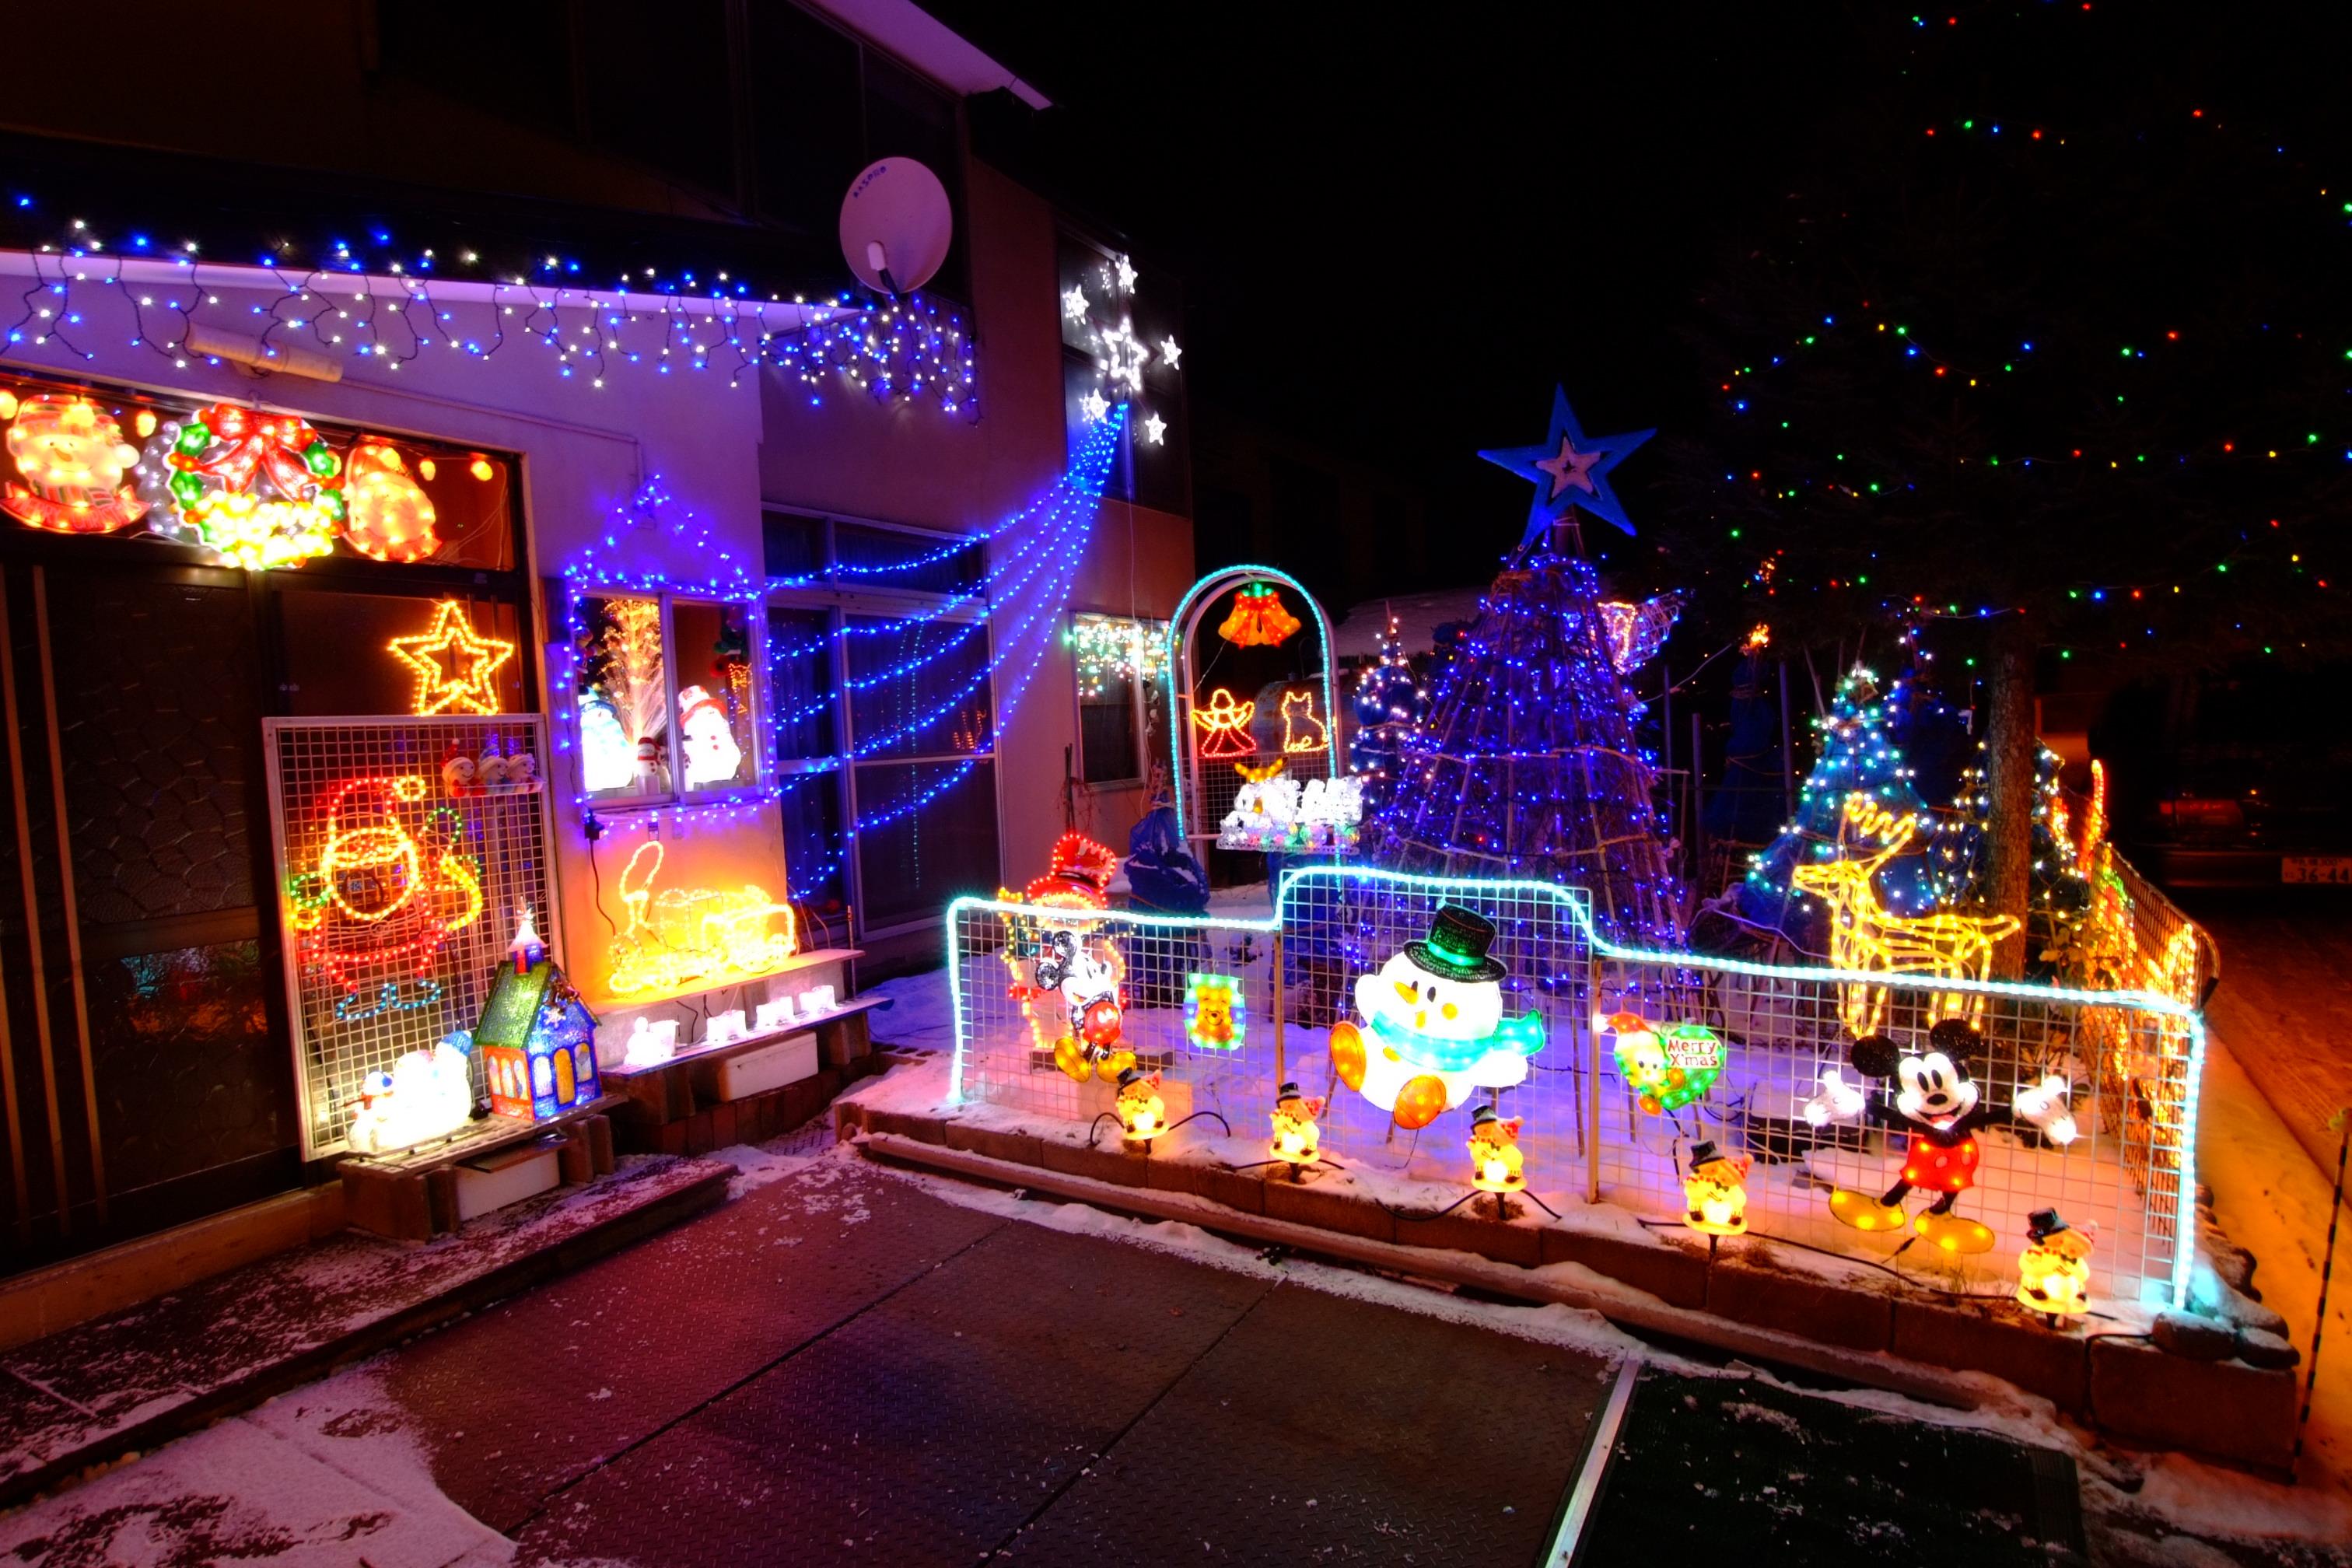 File:Merry Christmas^ Please spend a nice evening -) - panoramio.jpg ...